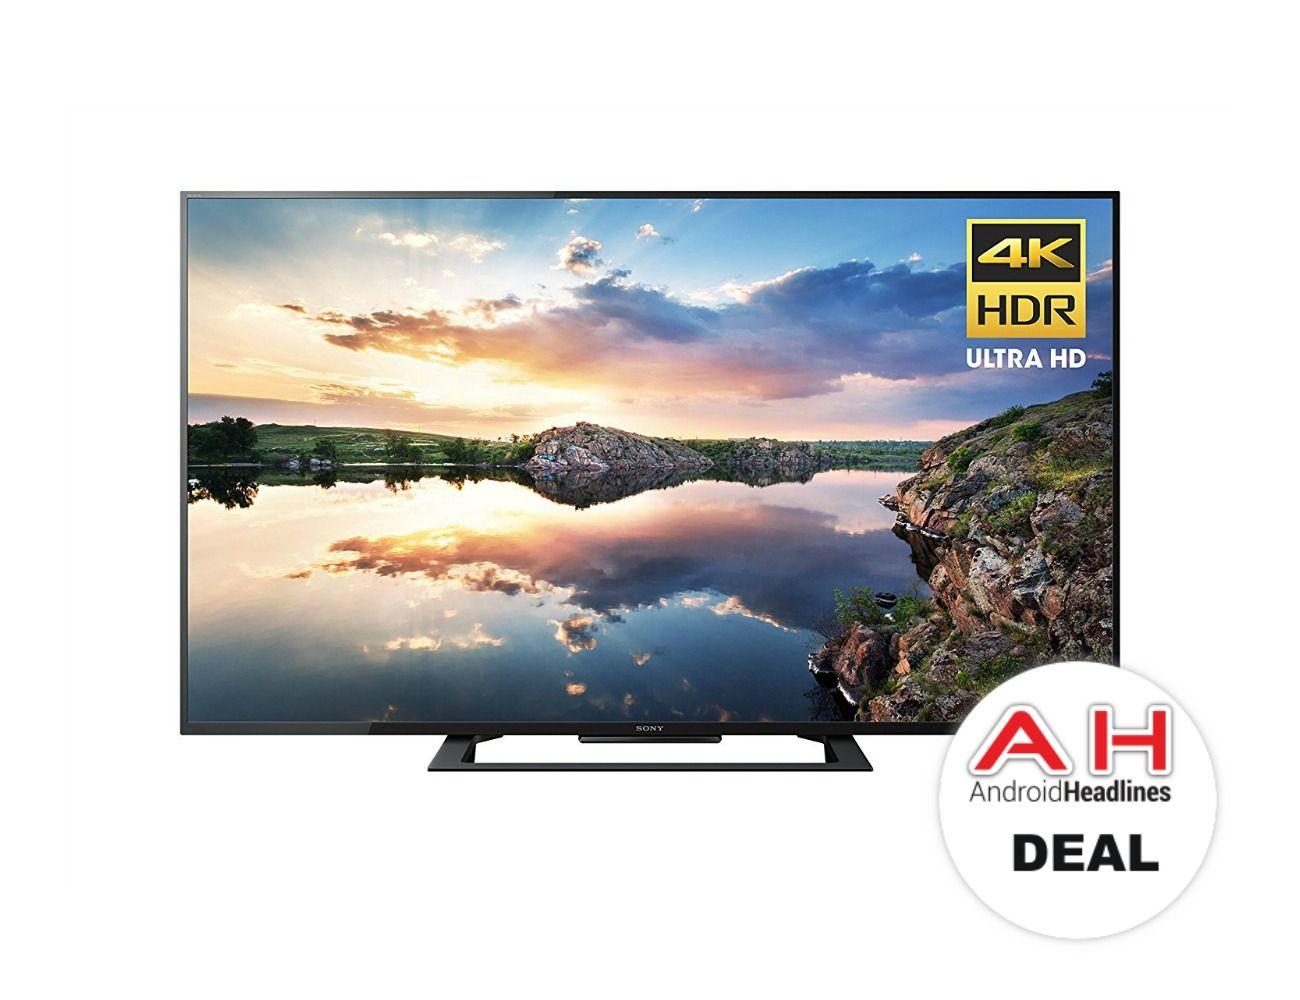 Deal Sony 60 Inch 4k Ultra Hd Smart Led Tv Kd60x690e For 898